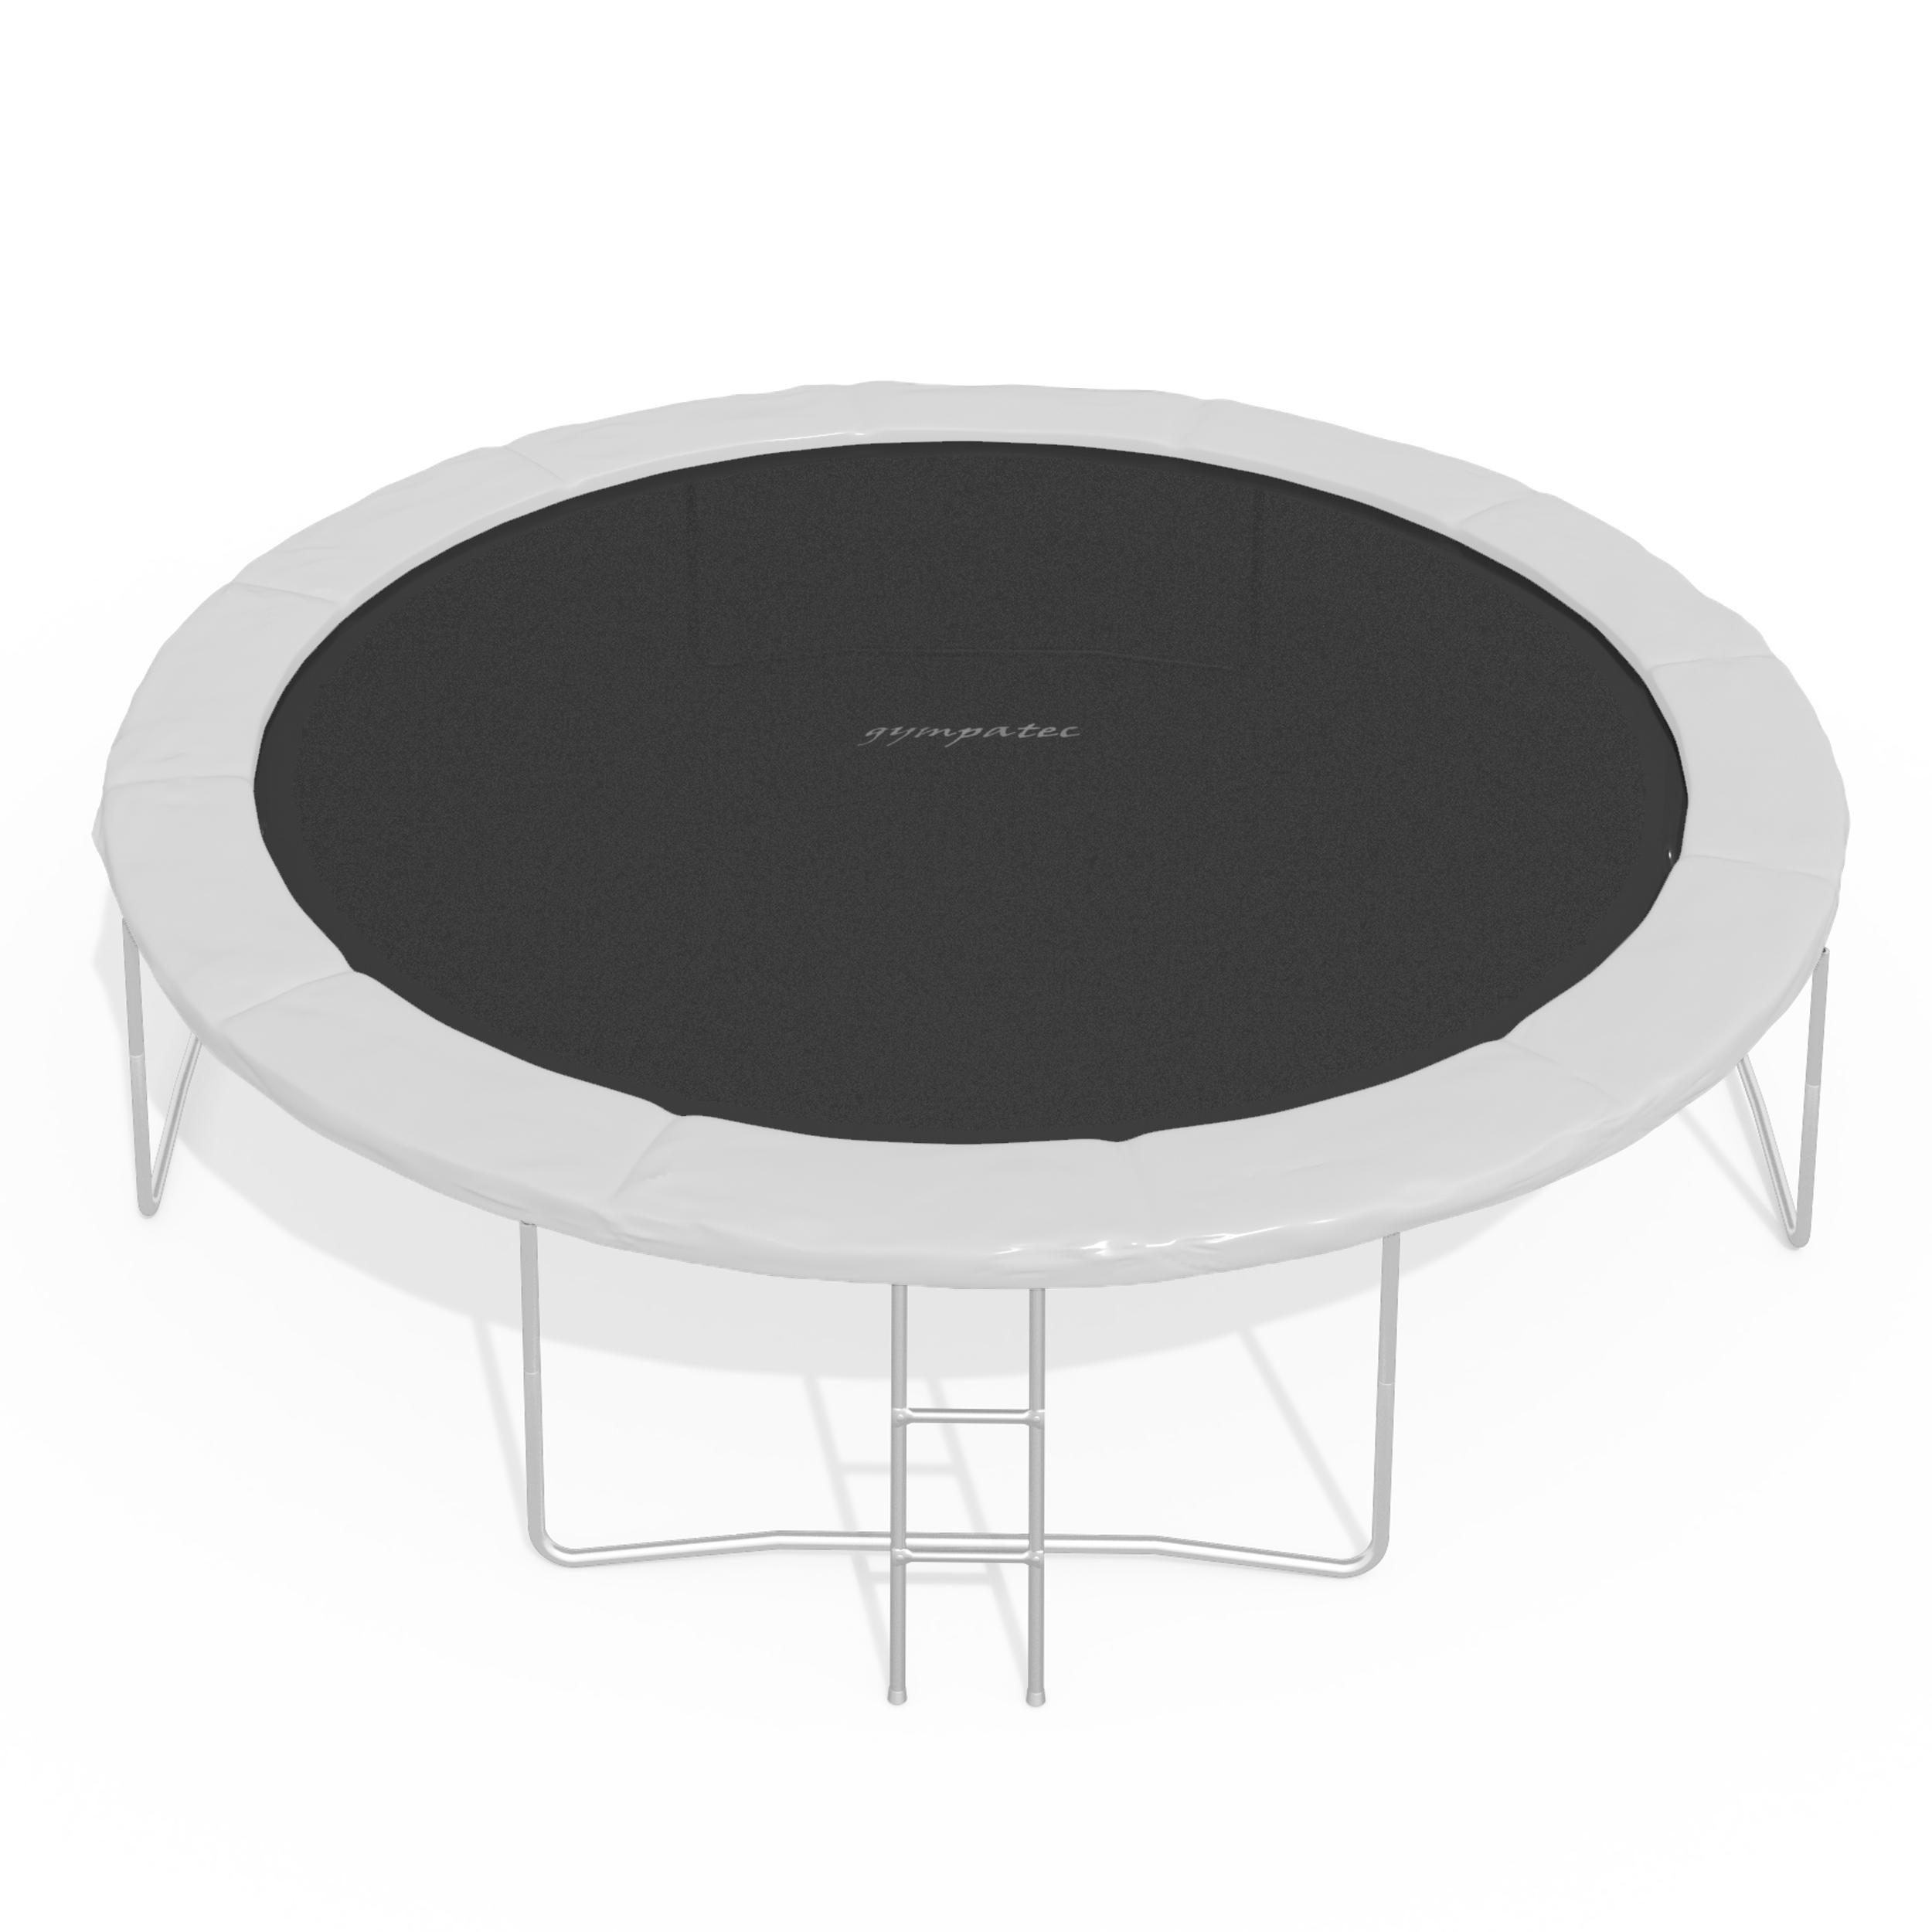 Tapis De Saut Plan De Saut Plan De Saut De Rechange Pour Trampoline 4 30m 80l Ebay